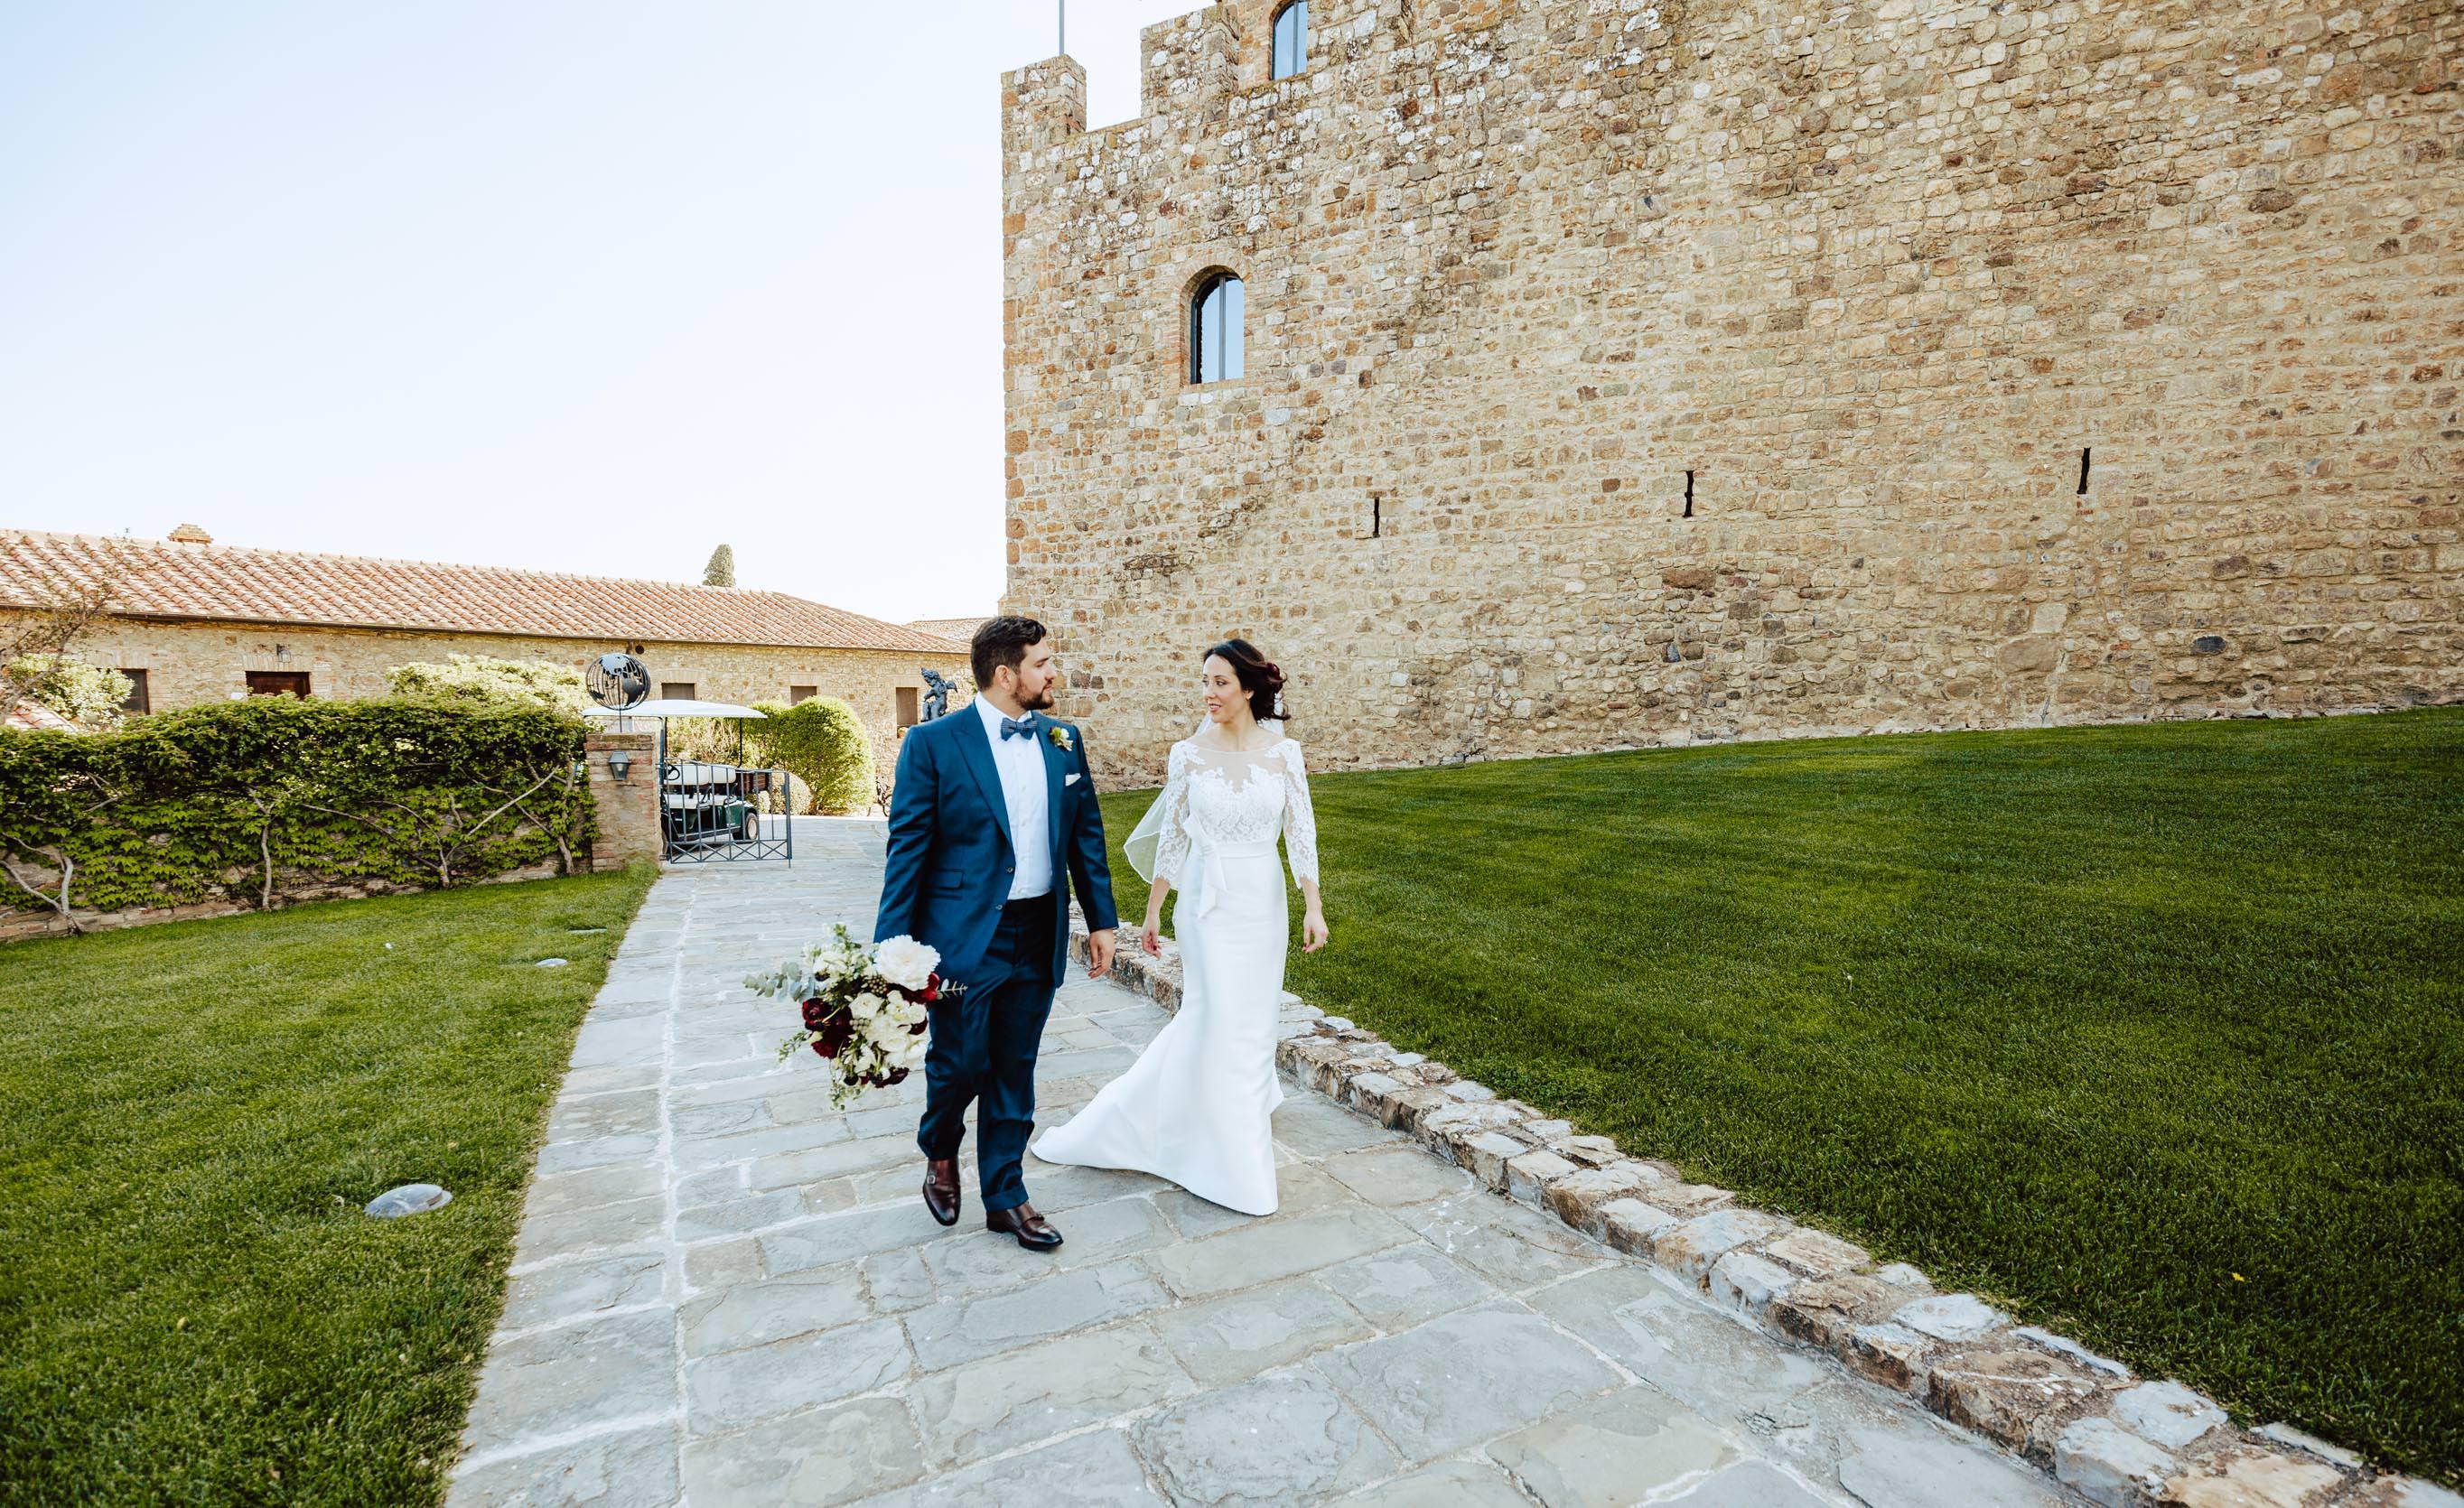 couple walking wedding castello di montalcino